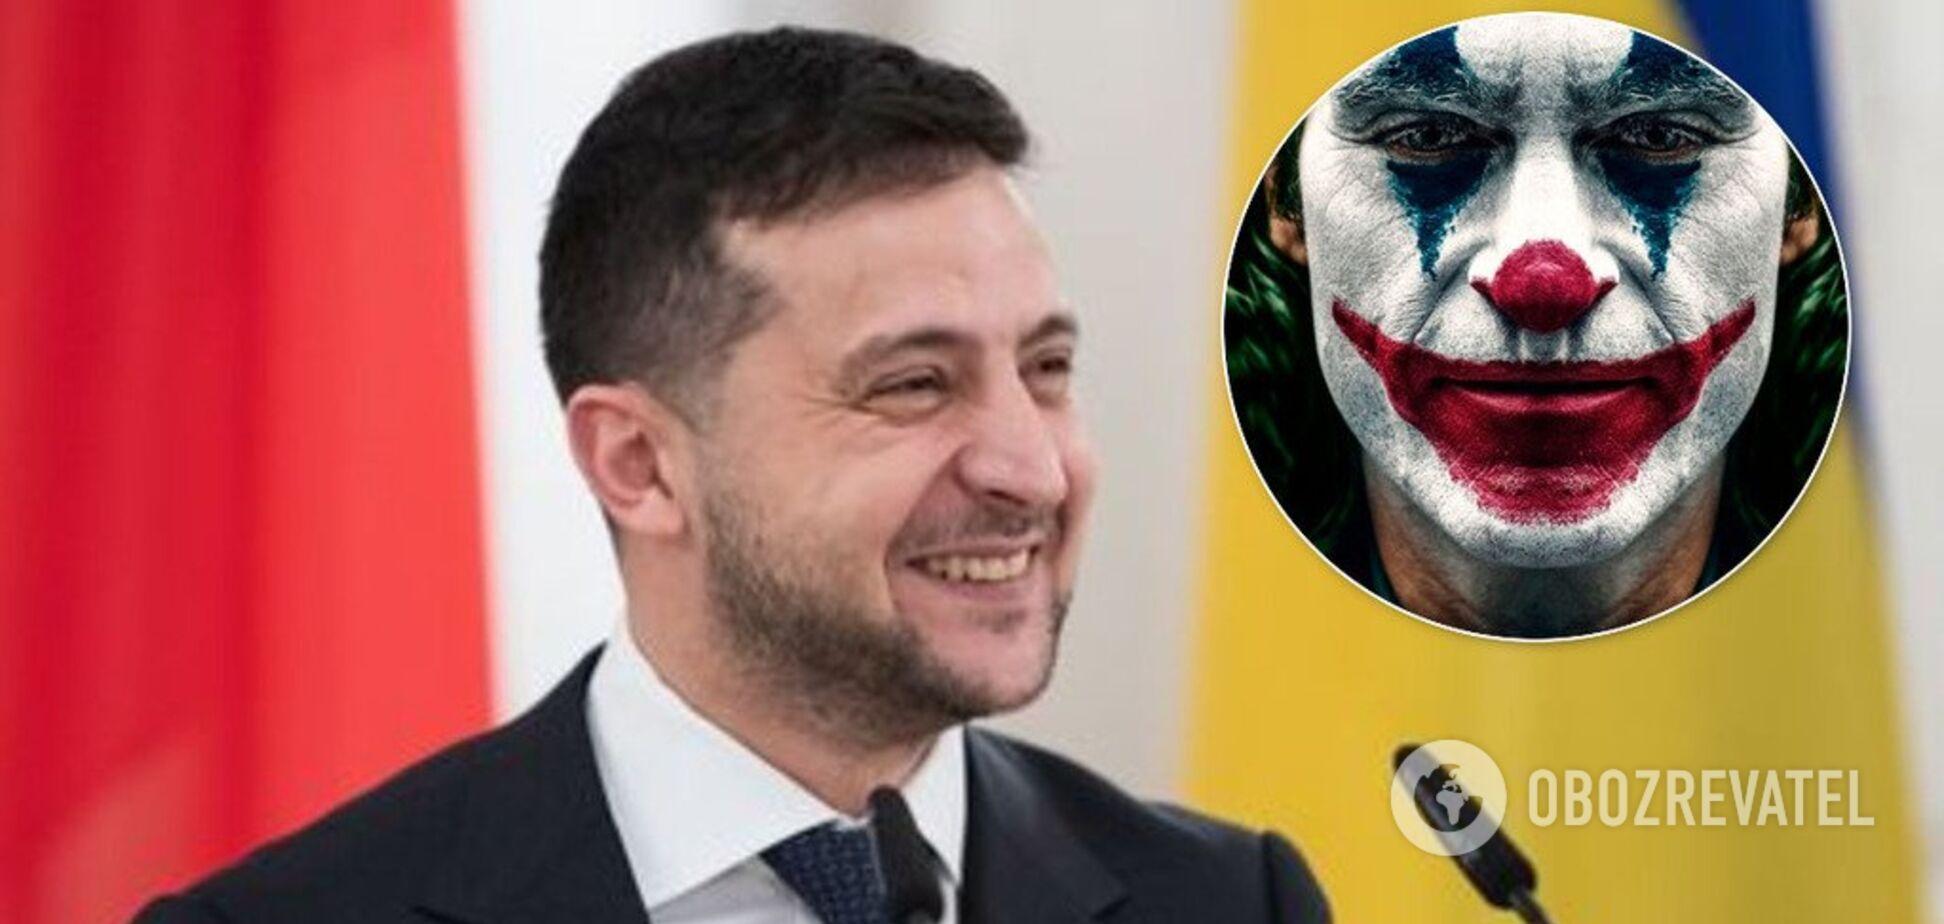 Зеленський і Джокер